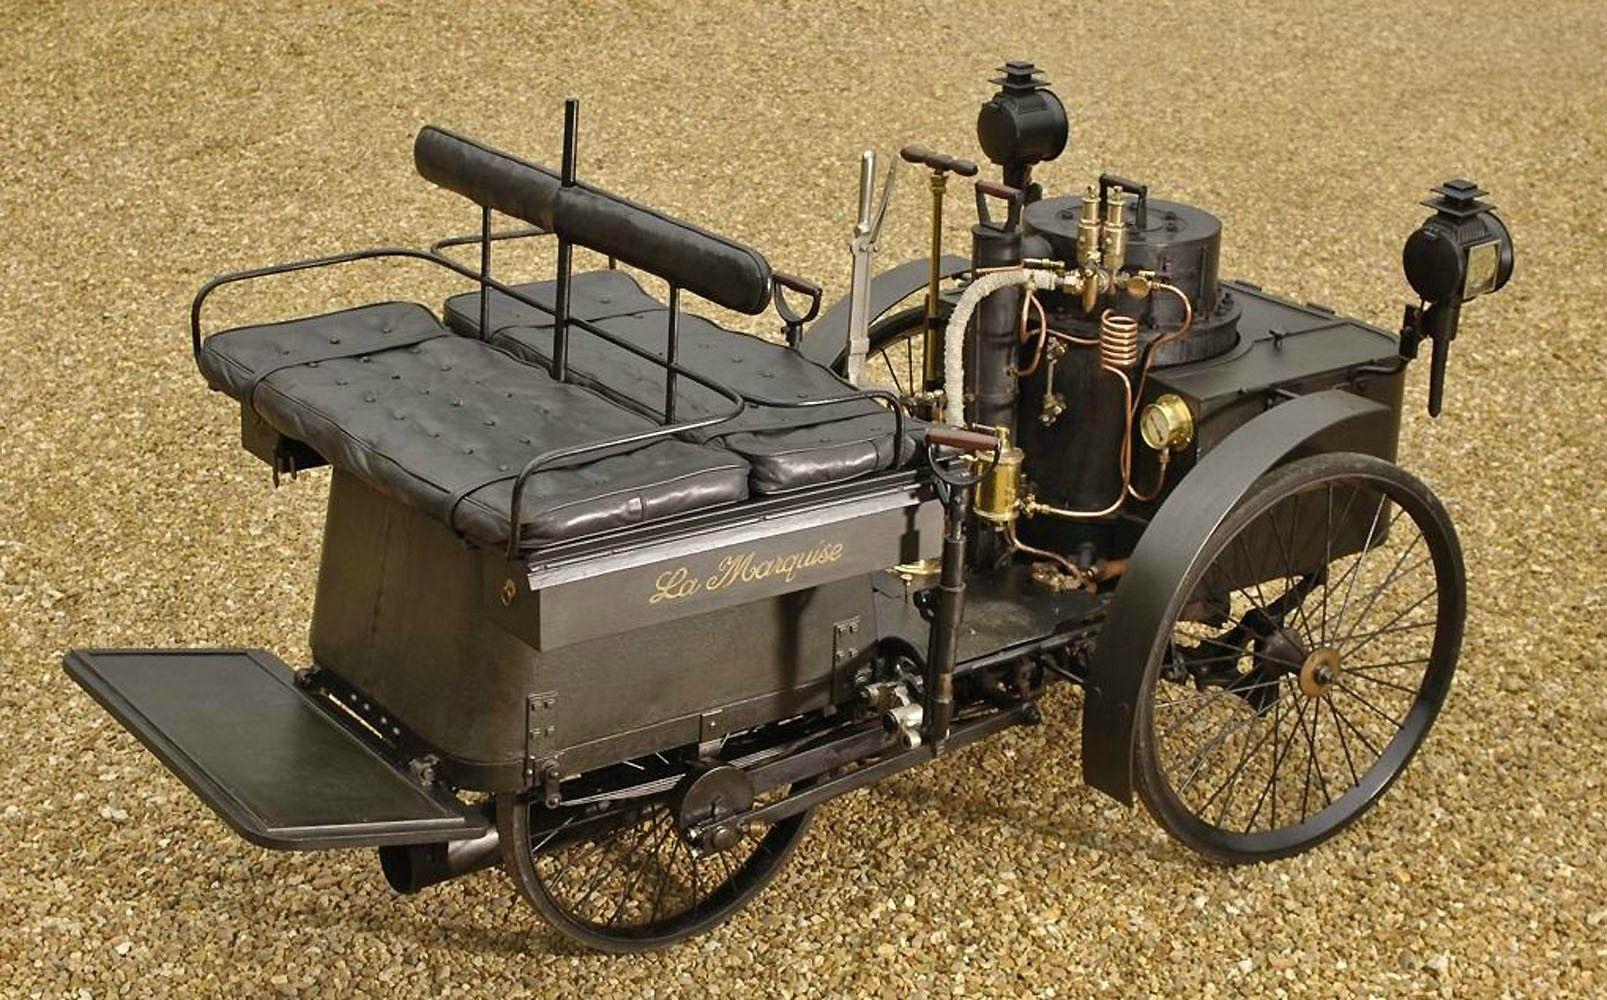 1884 De Dion Bouton Et Trepardou Dos A Dos Is The Oldest Running